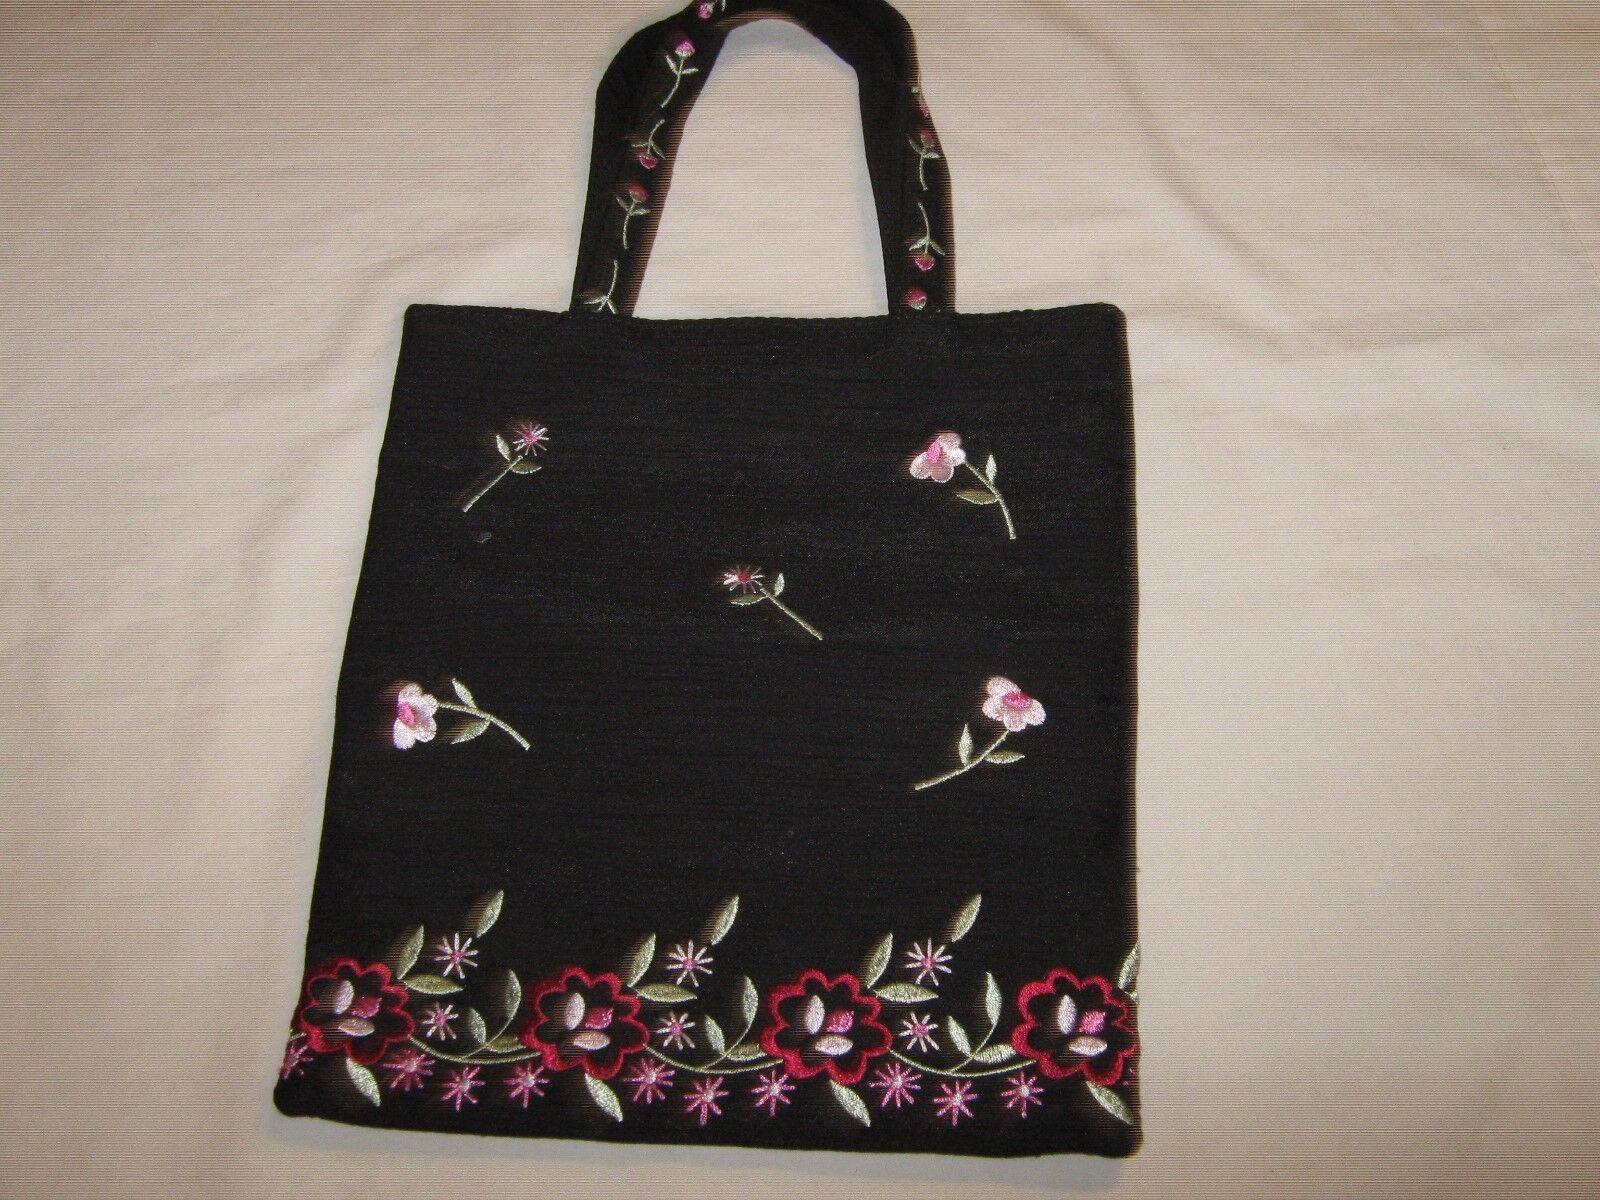 Purse, Liz Claiborne, Black With Floral Design,